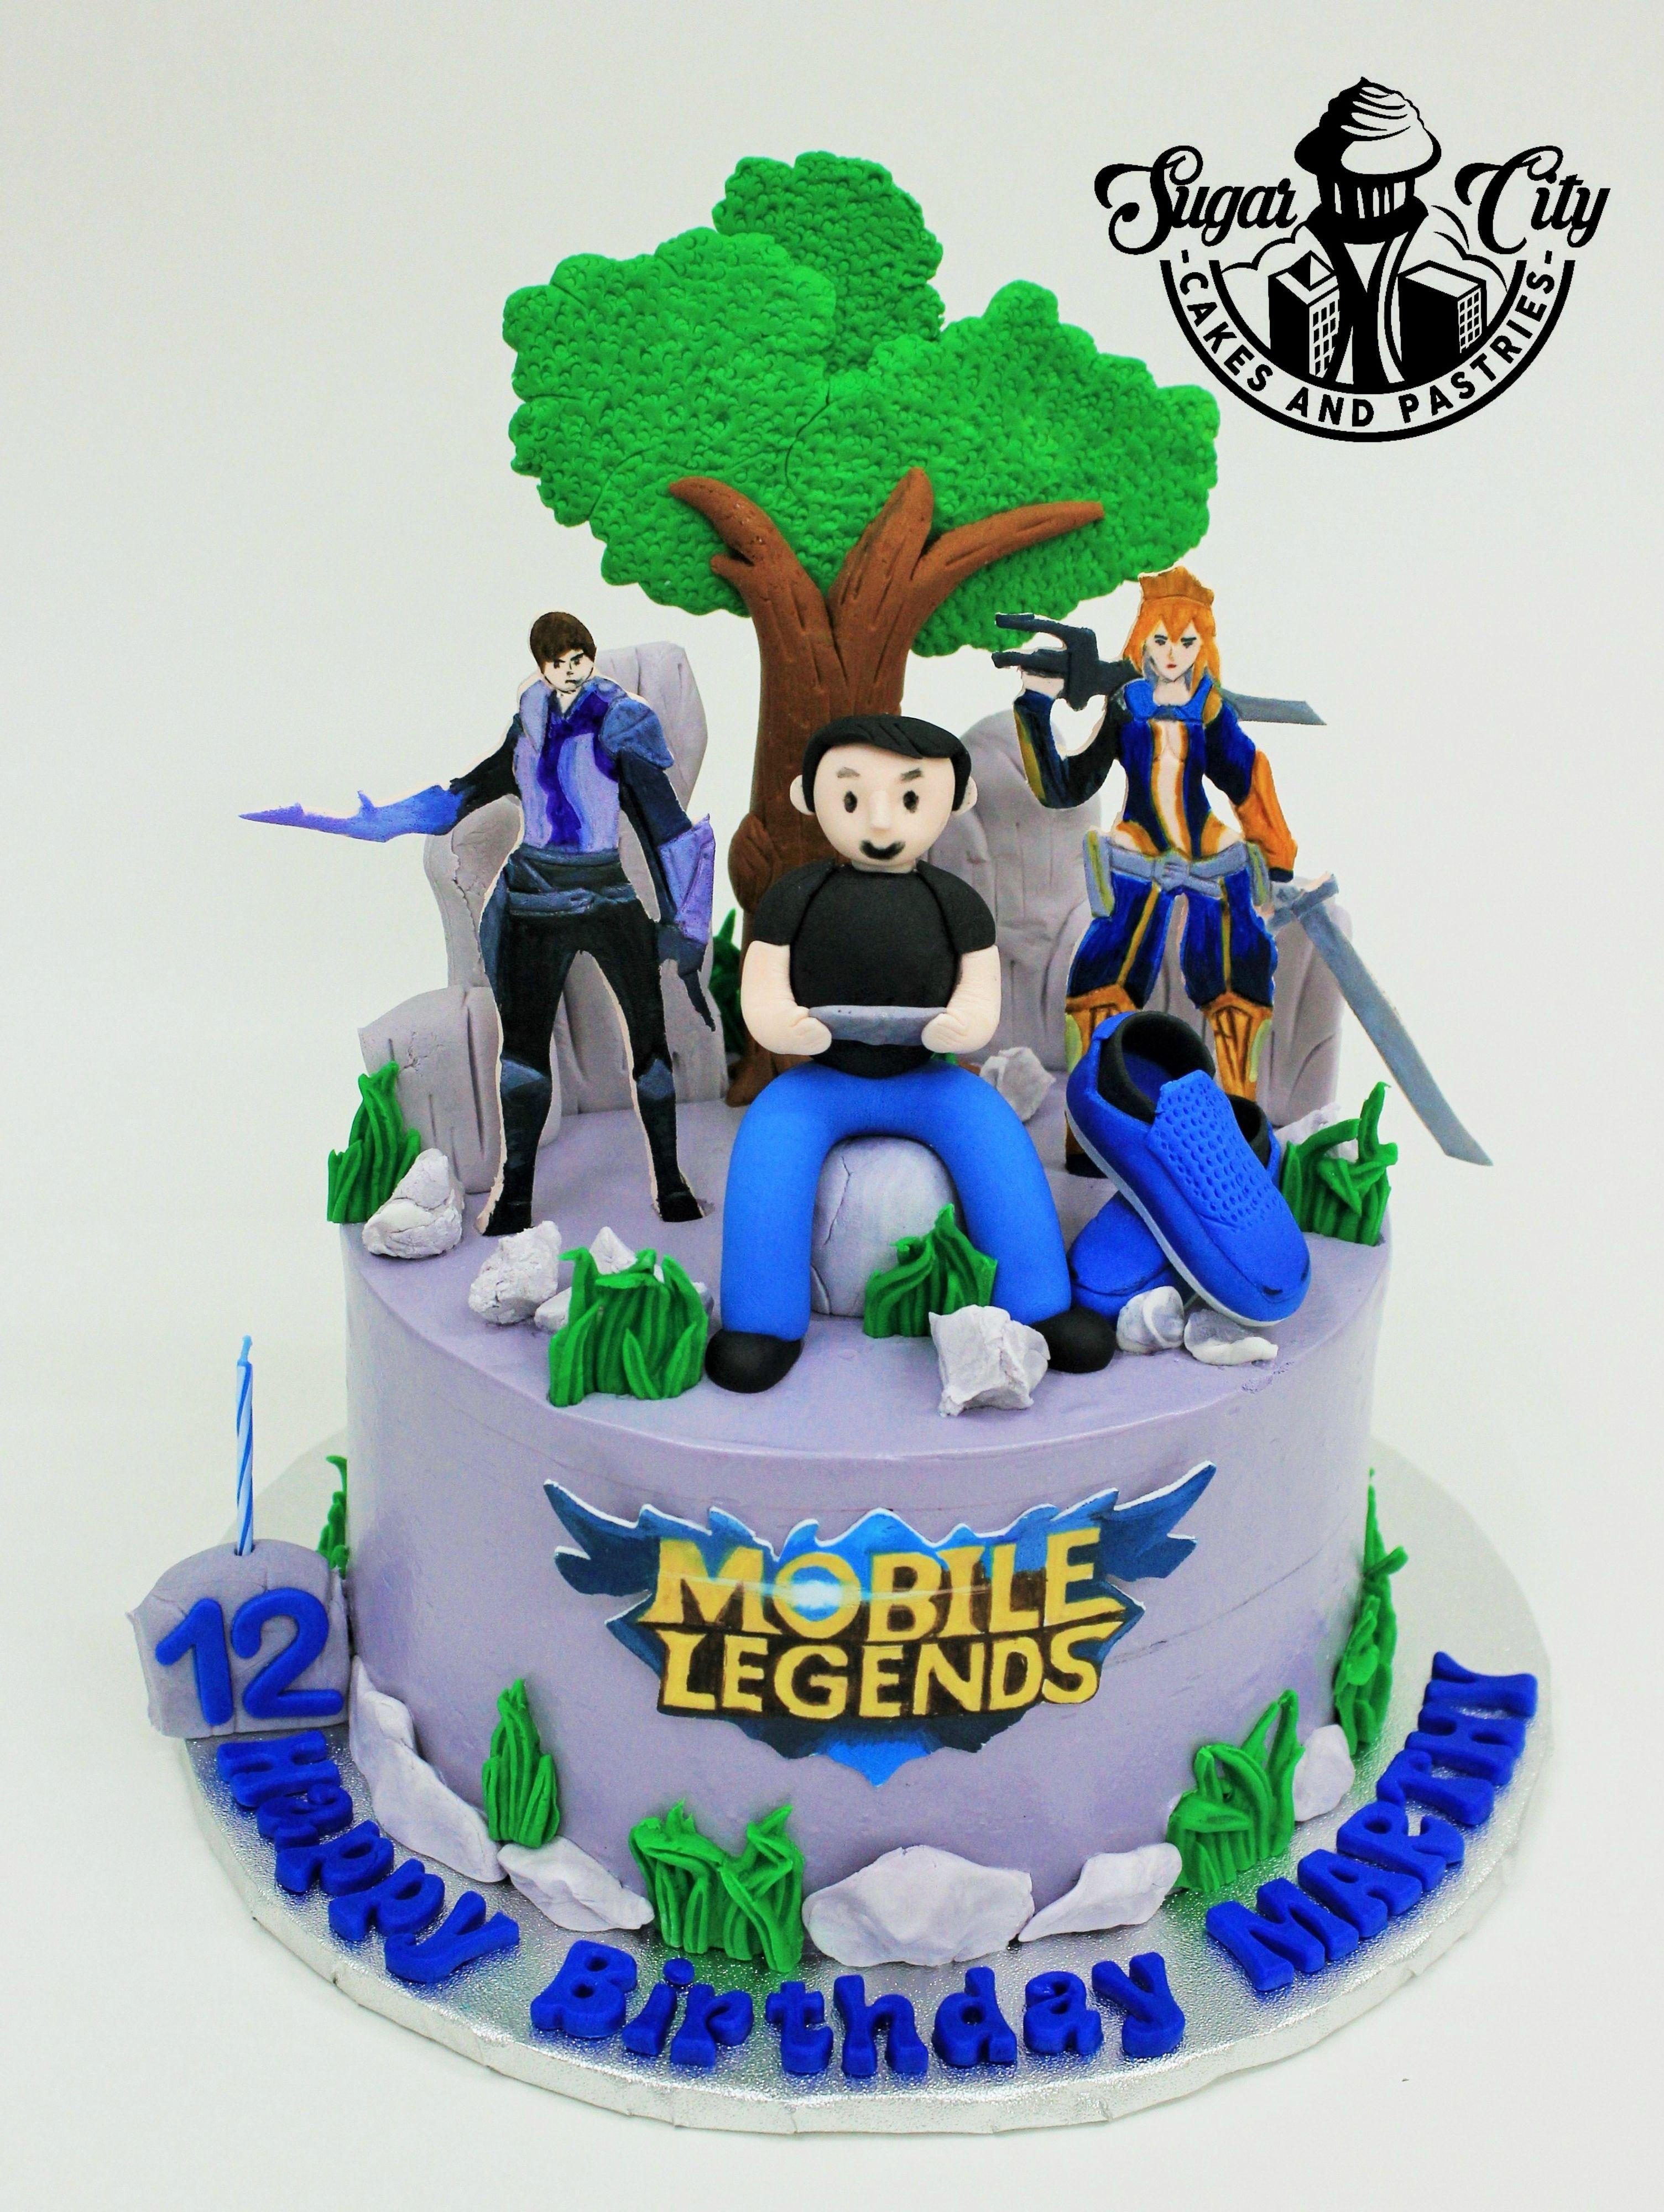 Mobile Legends Cake Cake Cake Decorating Cake Designs